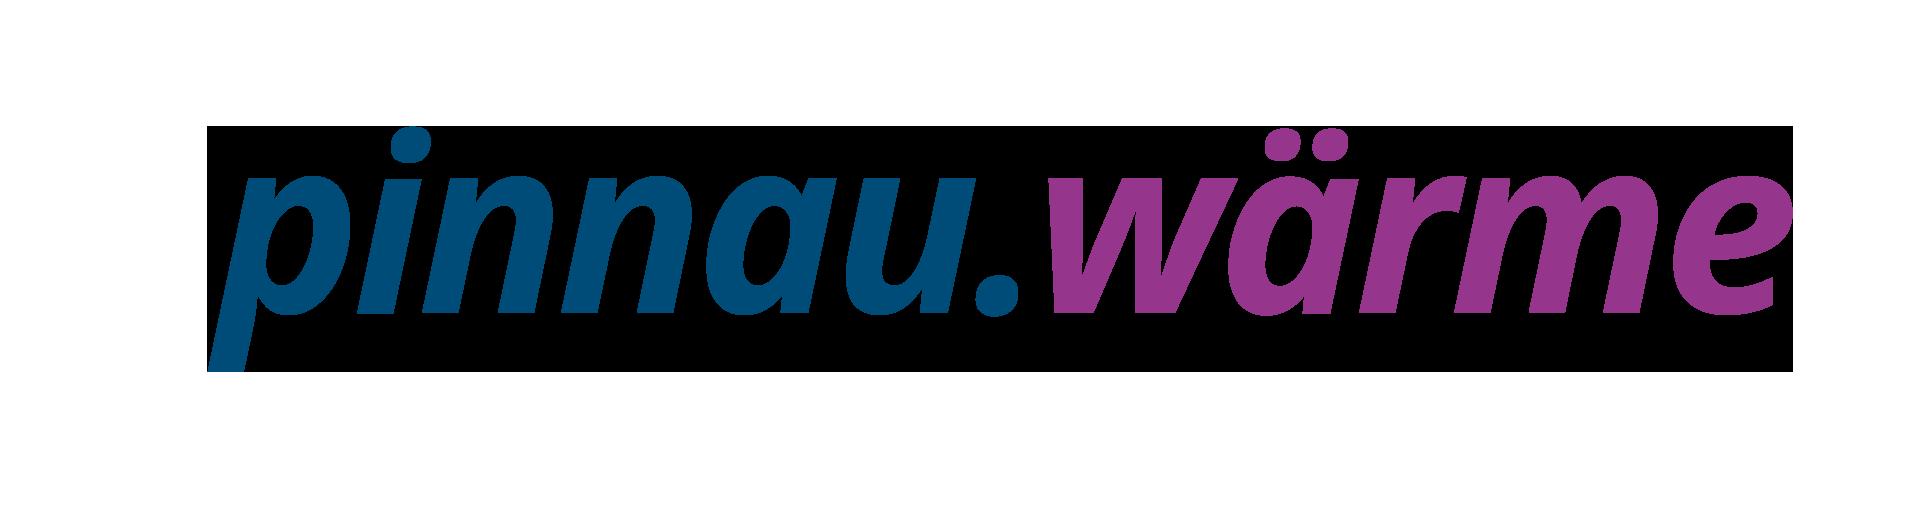 pinnau-waerme